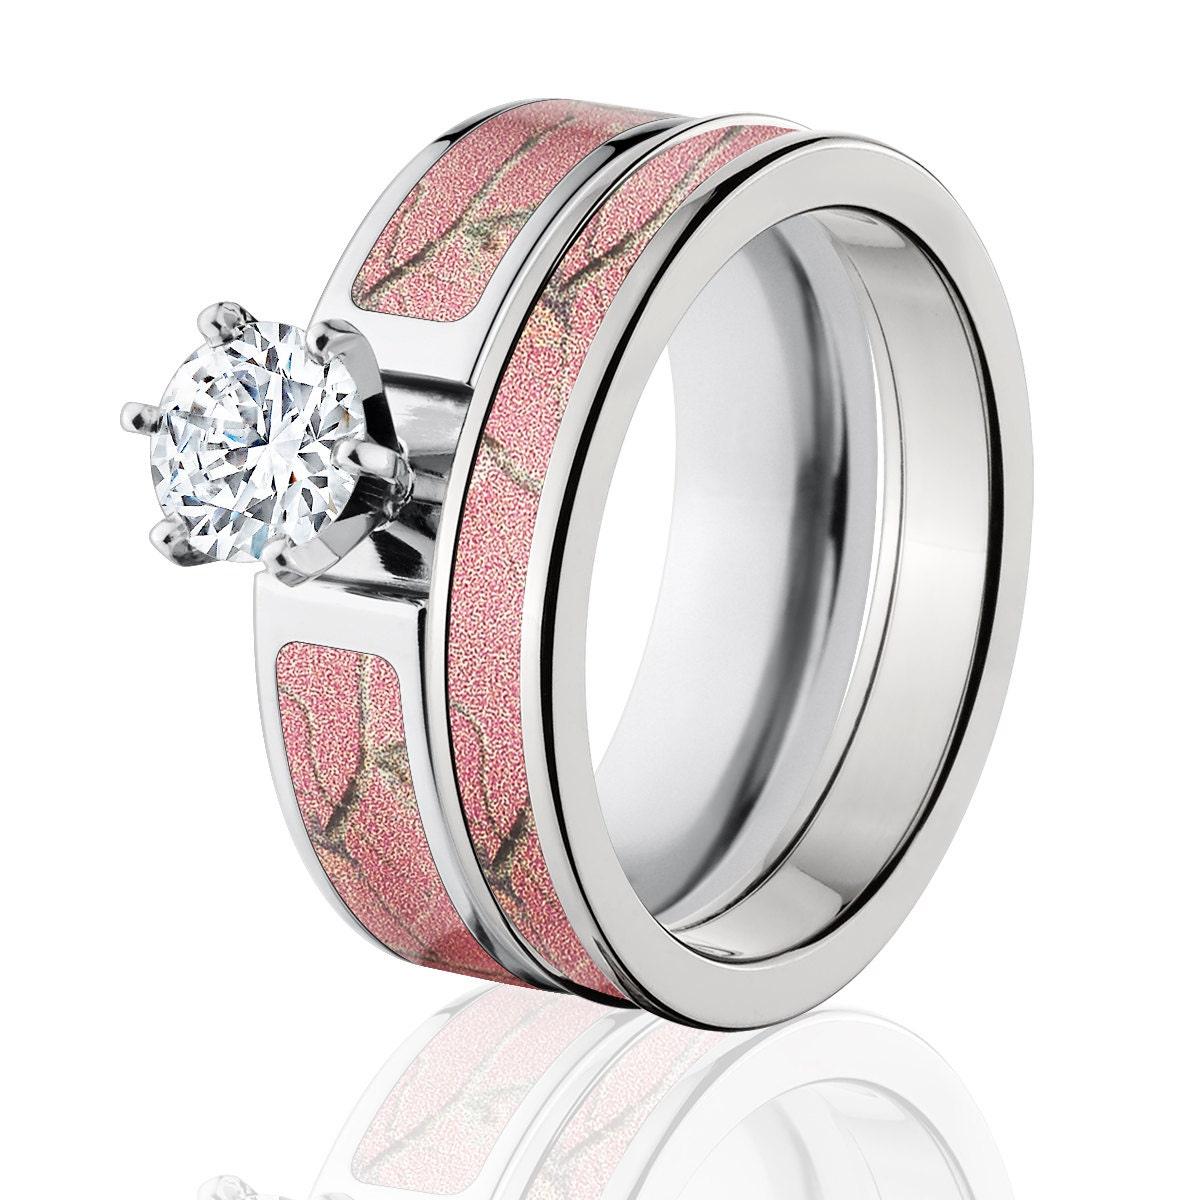 2b87f6b29 Cobalt Camo Bridal Set with 1ct Round CZ RealTree AP Pink Camo | Etsy